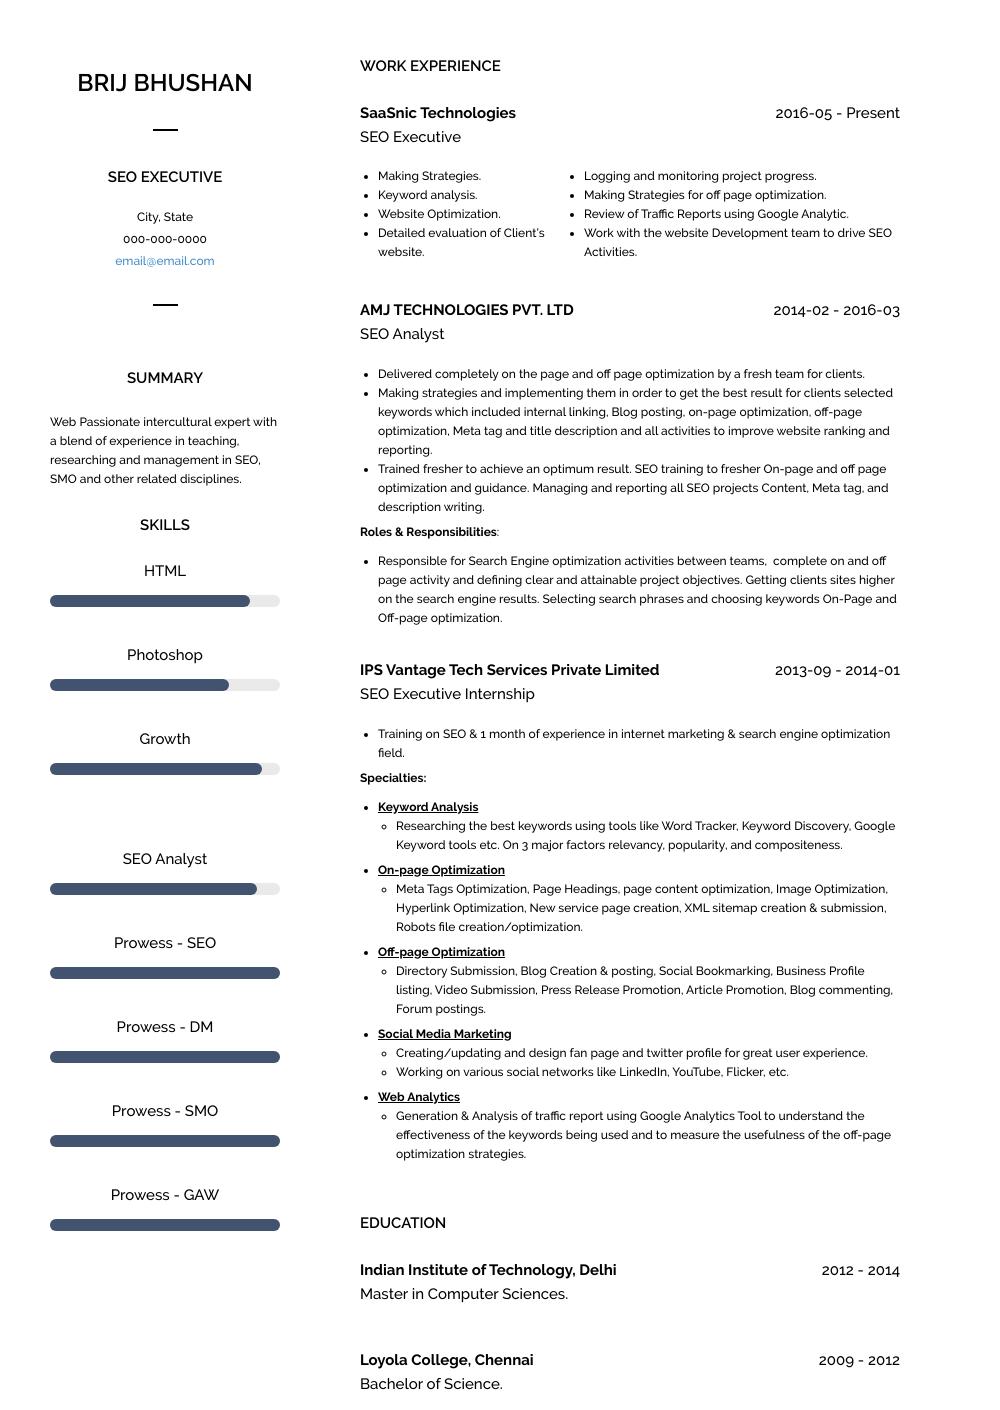 seo executive resume template